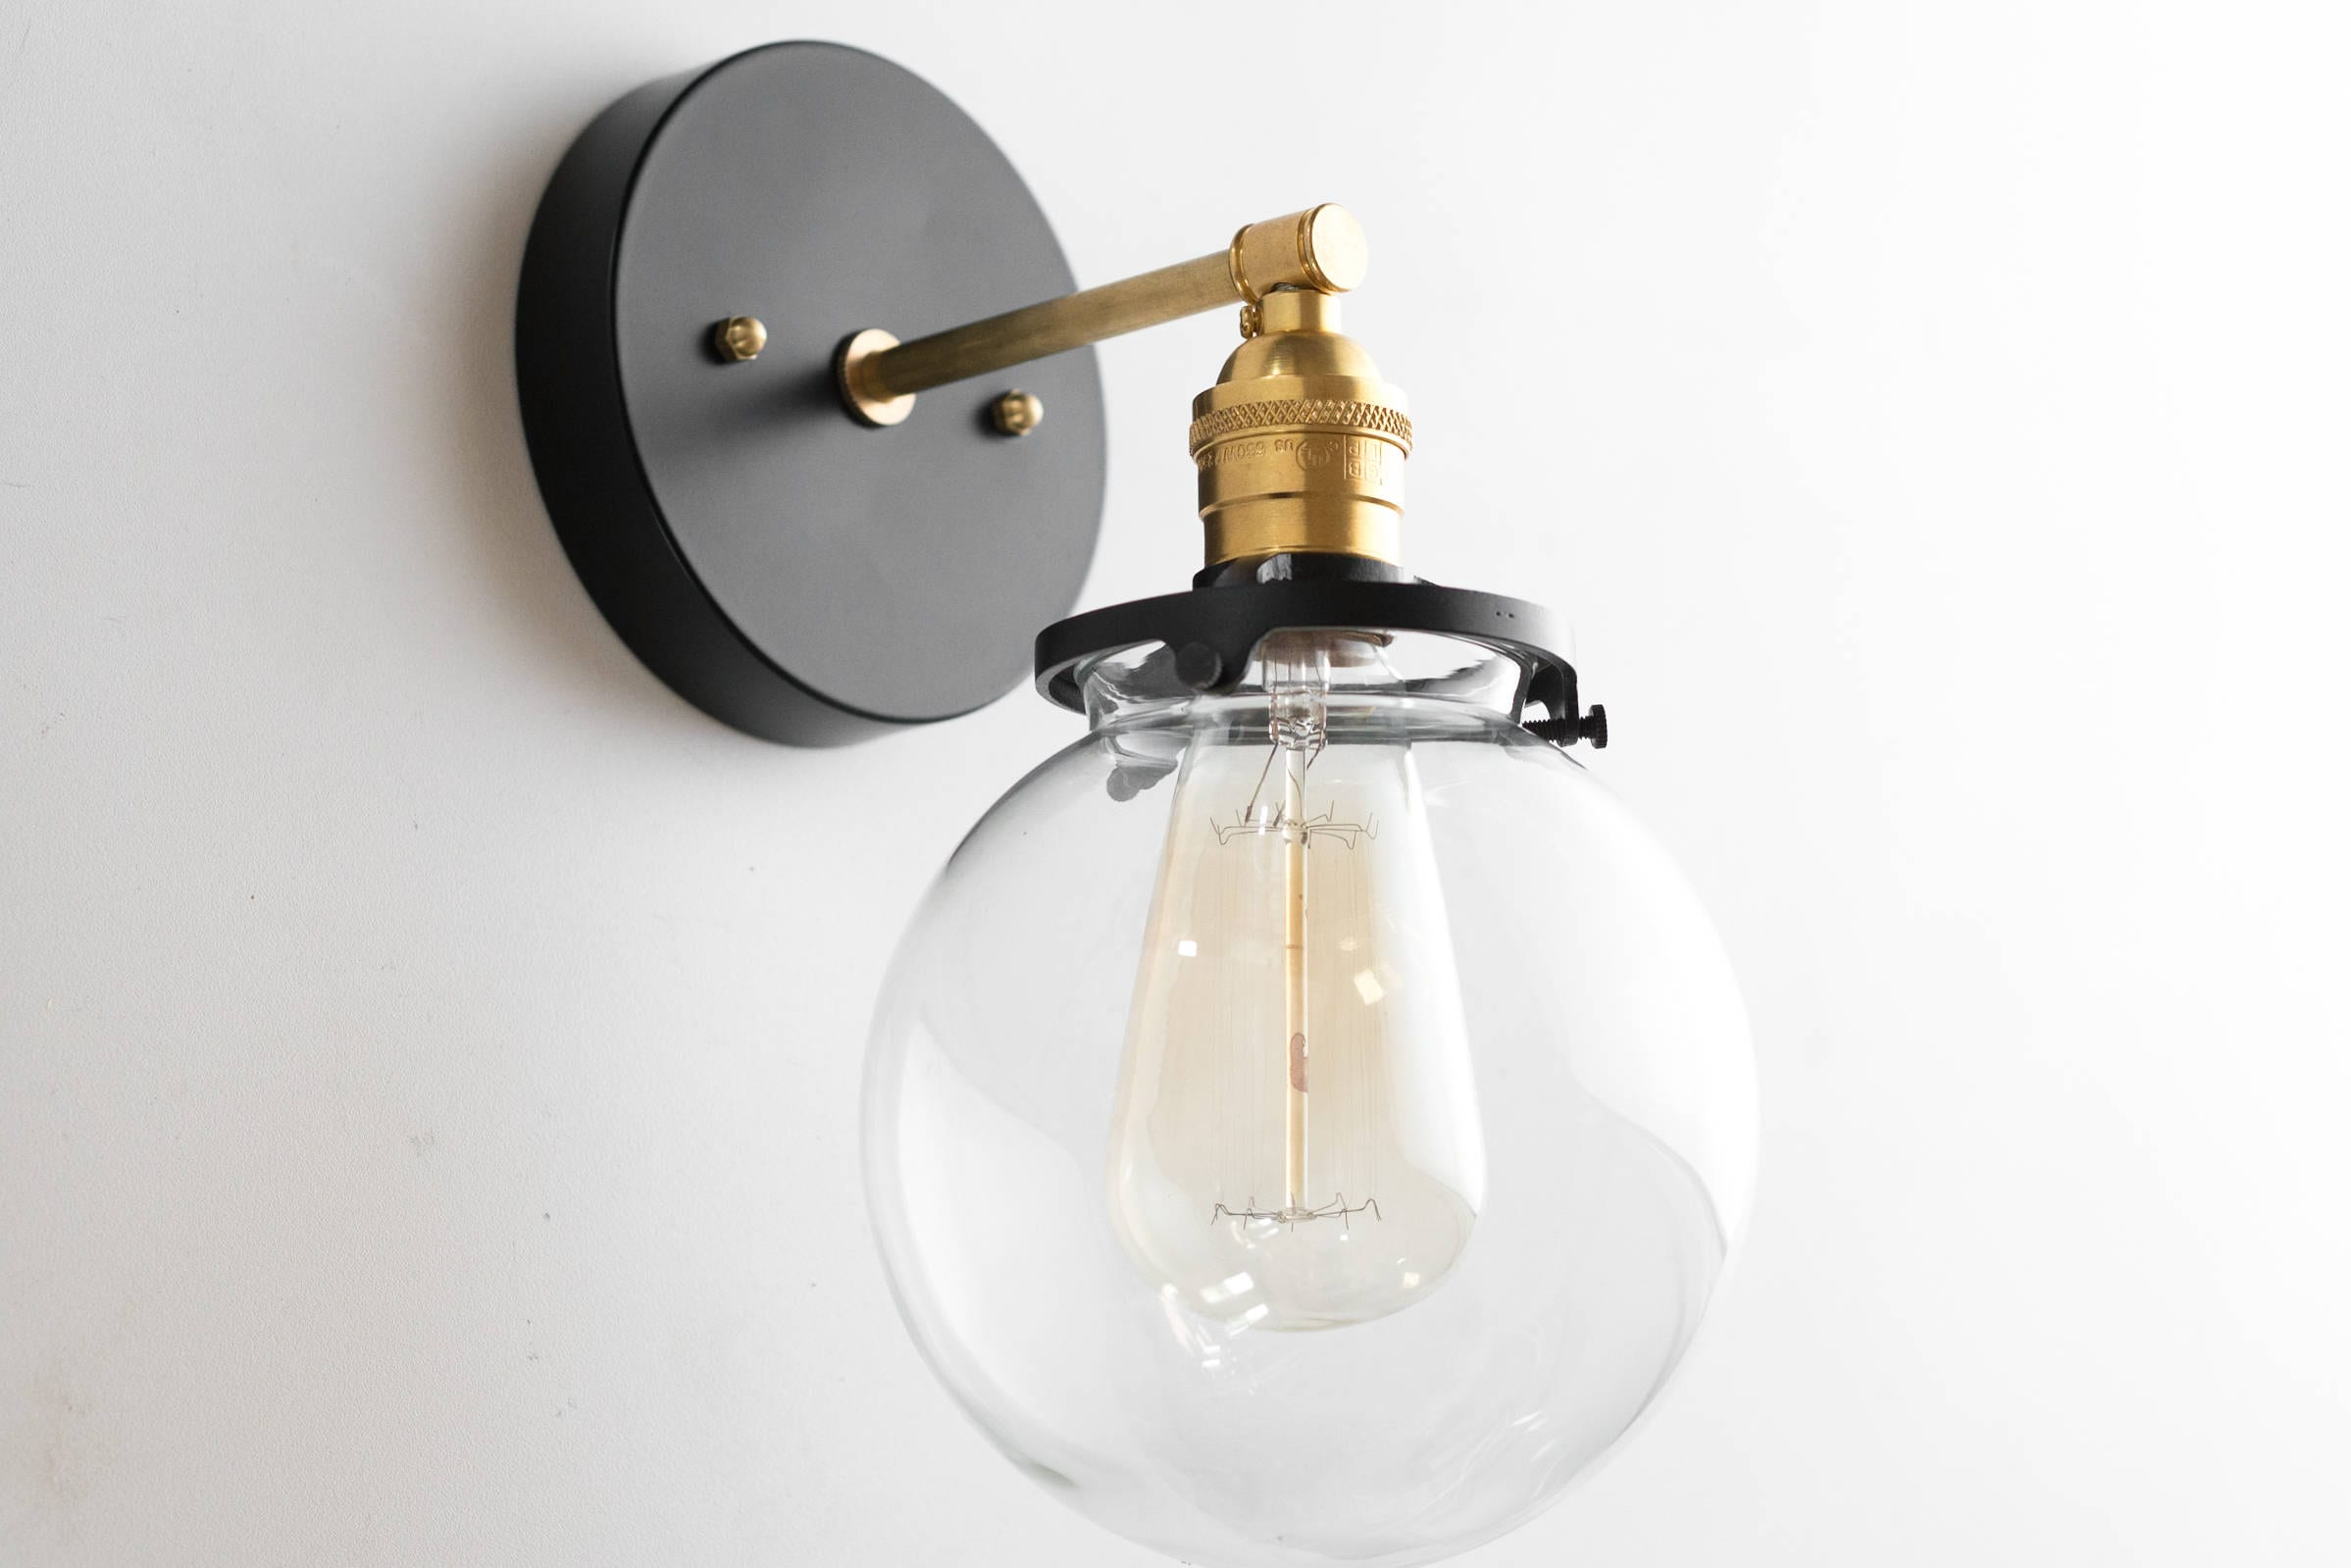 Modern farmhouse wall sconces brass sconce light edison wall lighting mid century modern